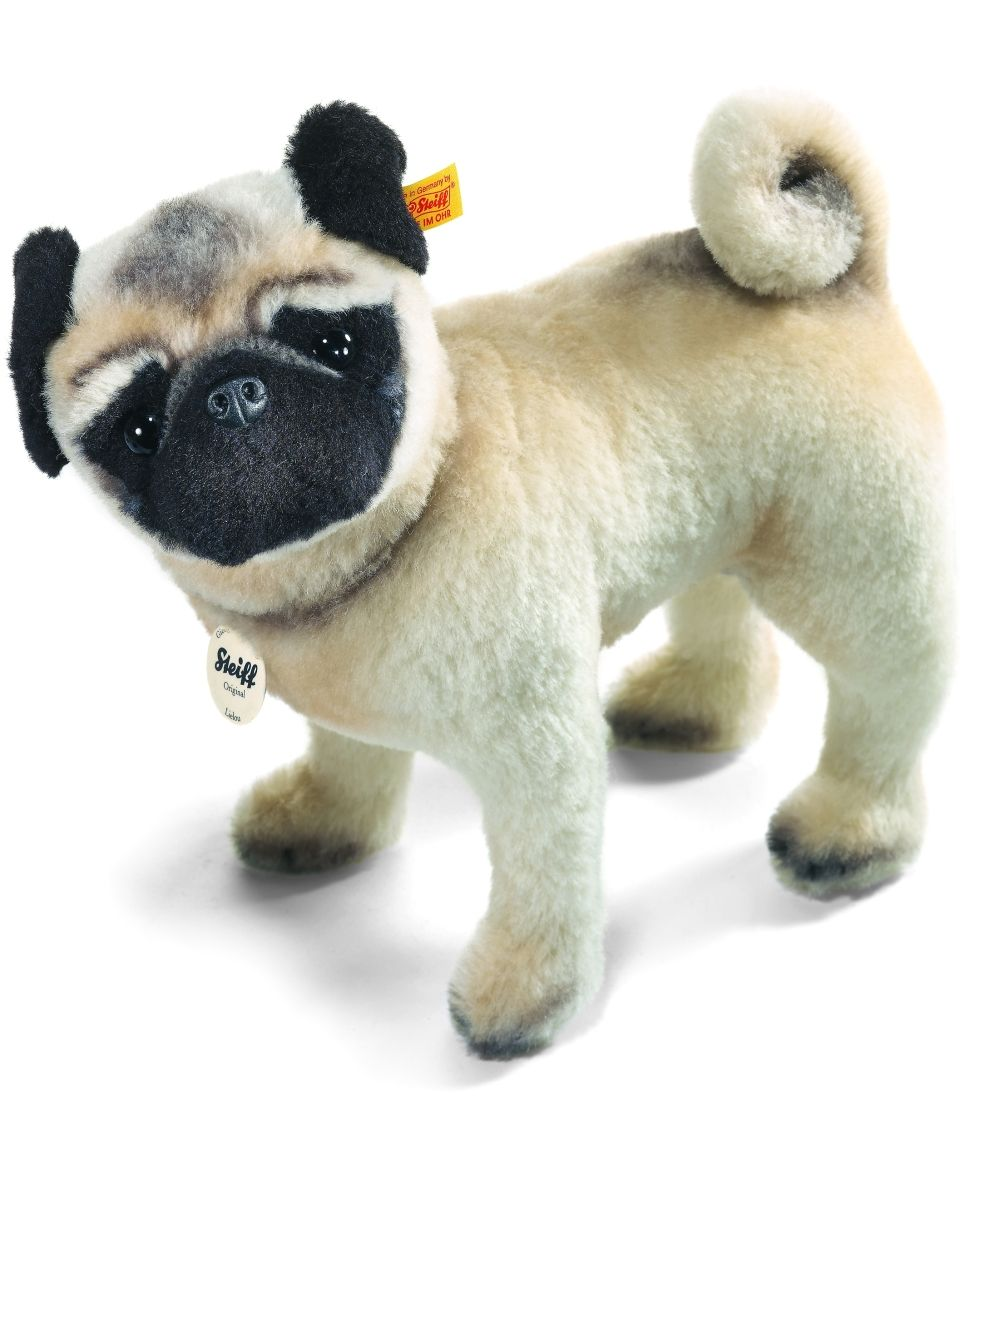 Steiff Lielou Pug Mohair Stuffed Animal Pug Dog Puppy